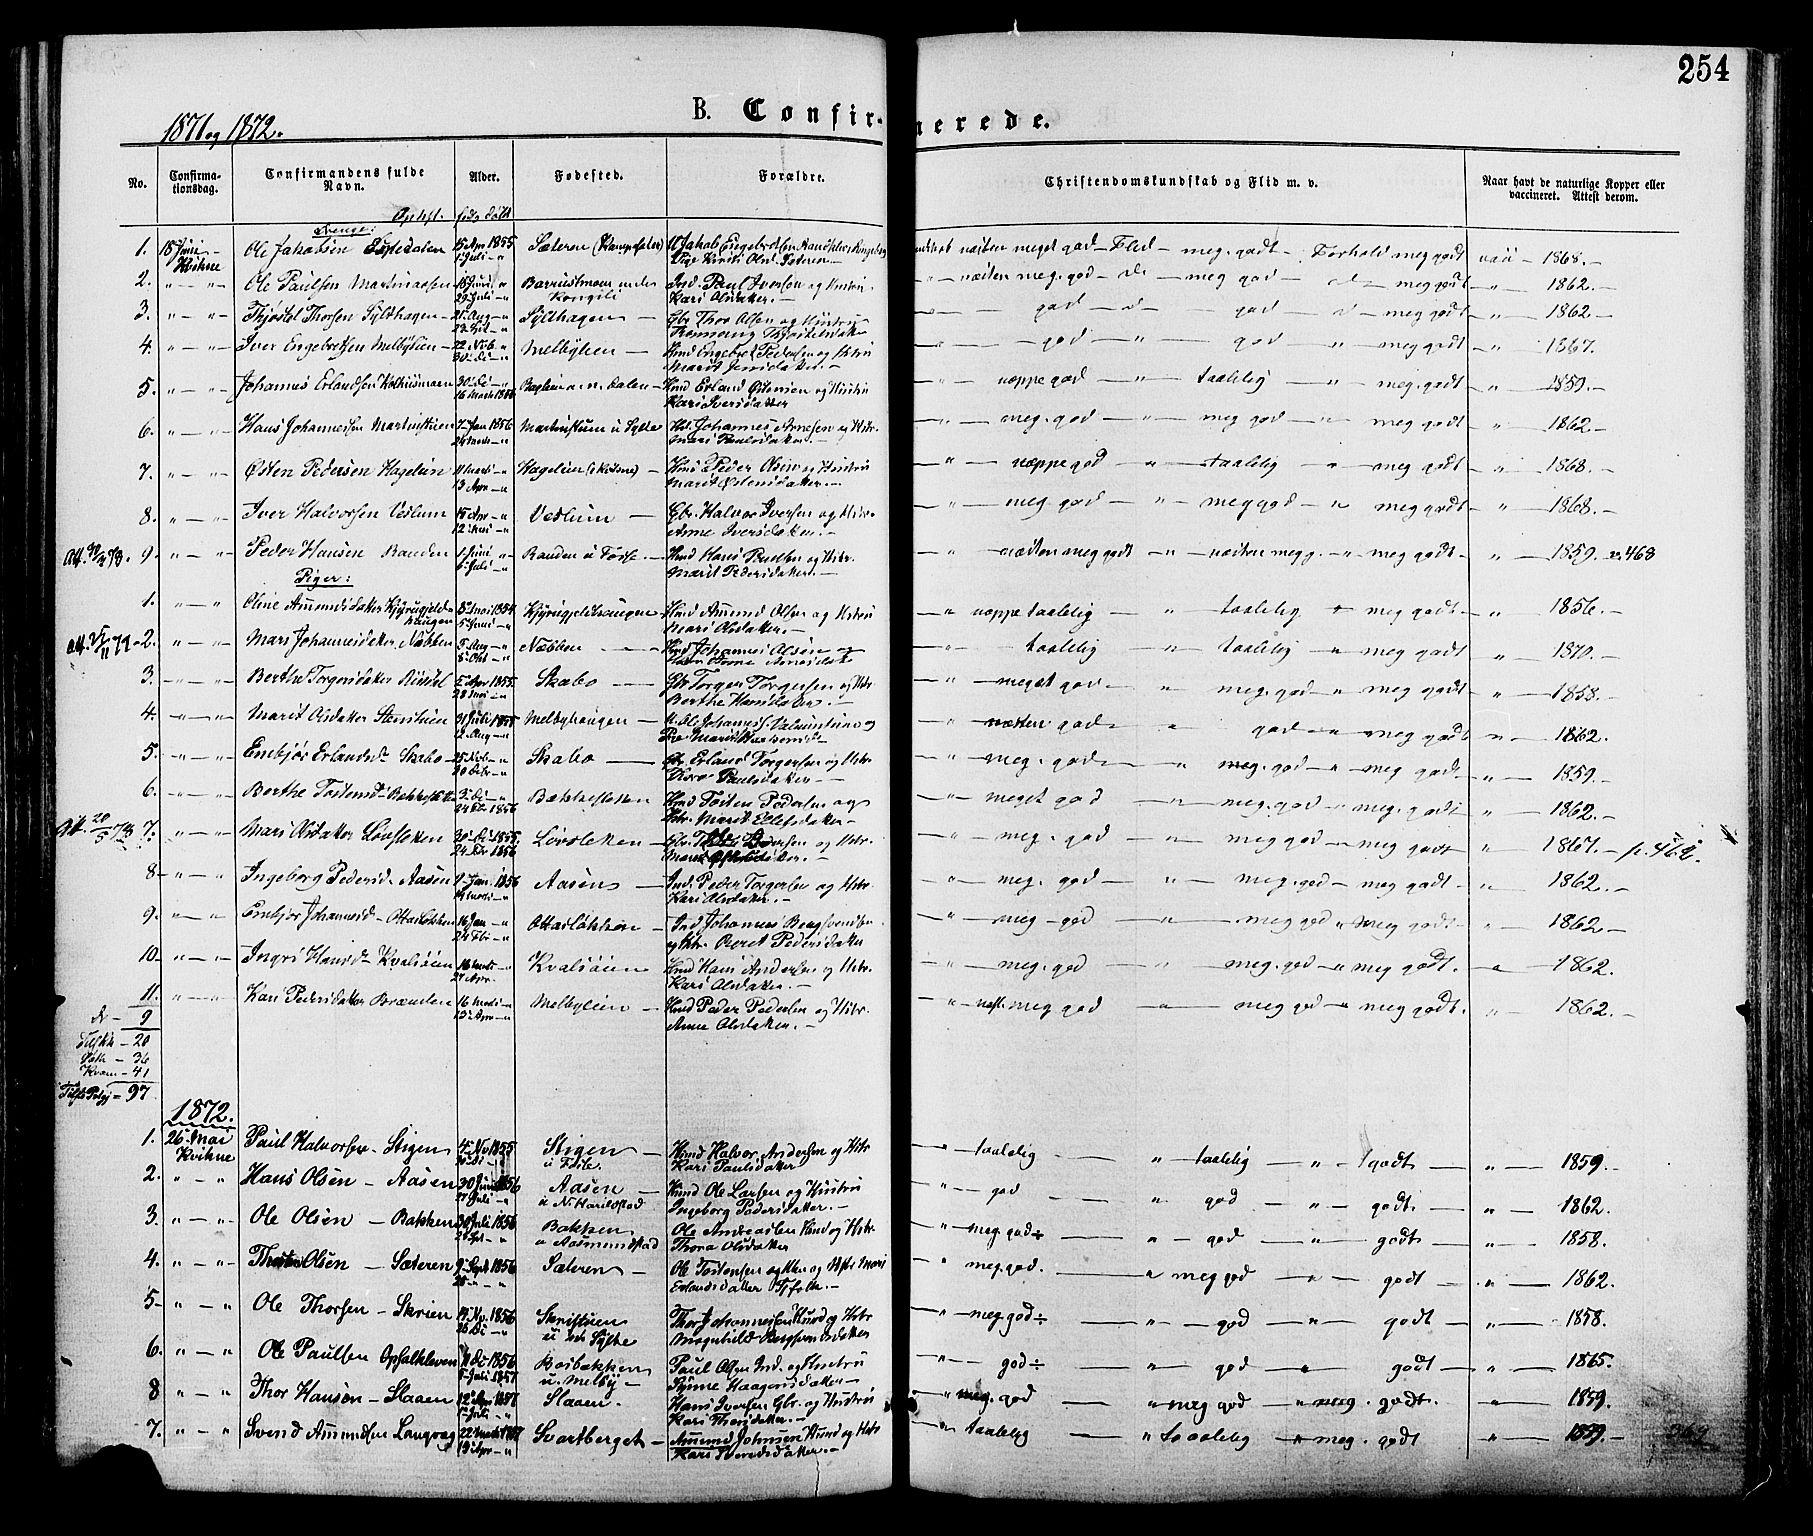 SAH, Nord-Fron prestekontor, Ministerialbok nr. 2, 1865-1883, s. 254